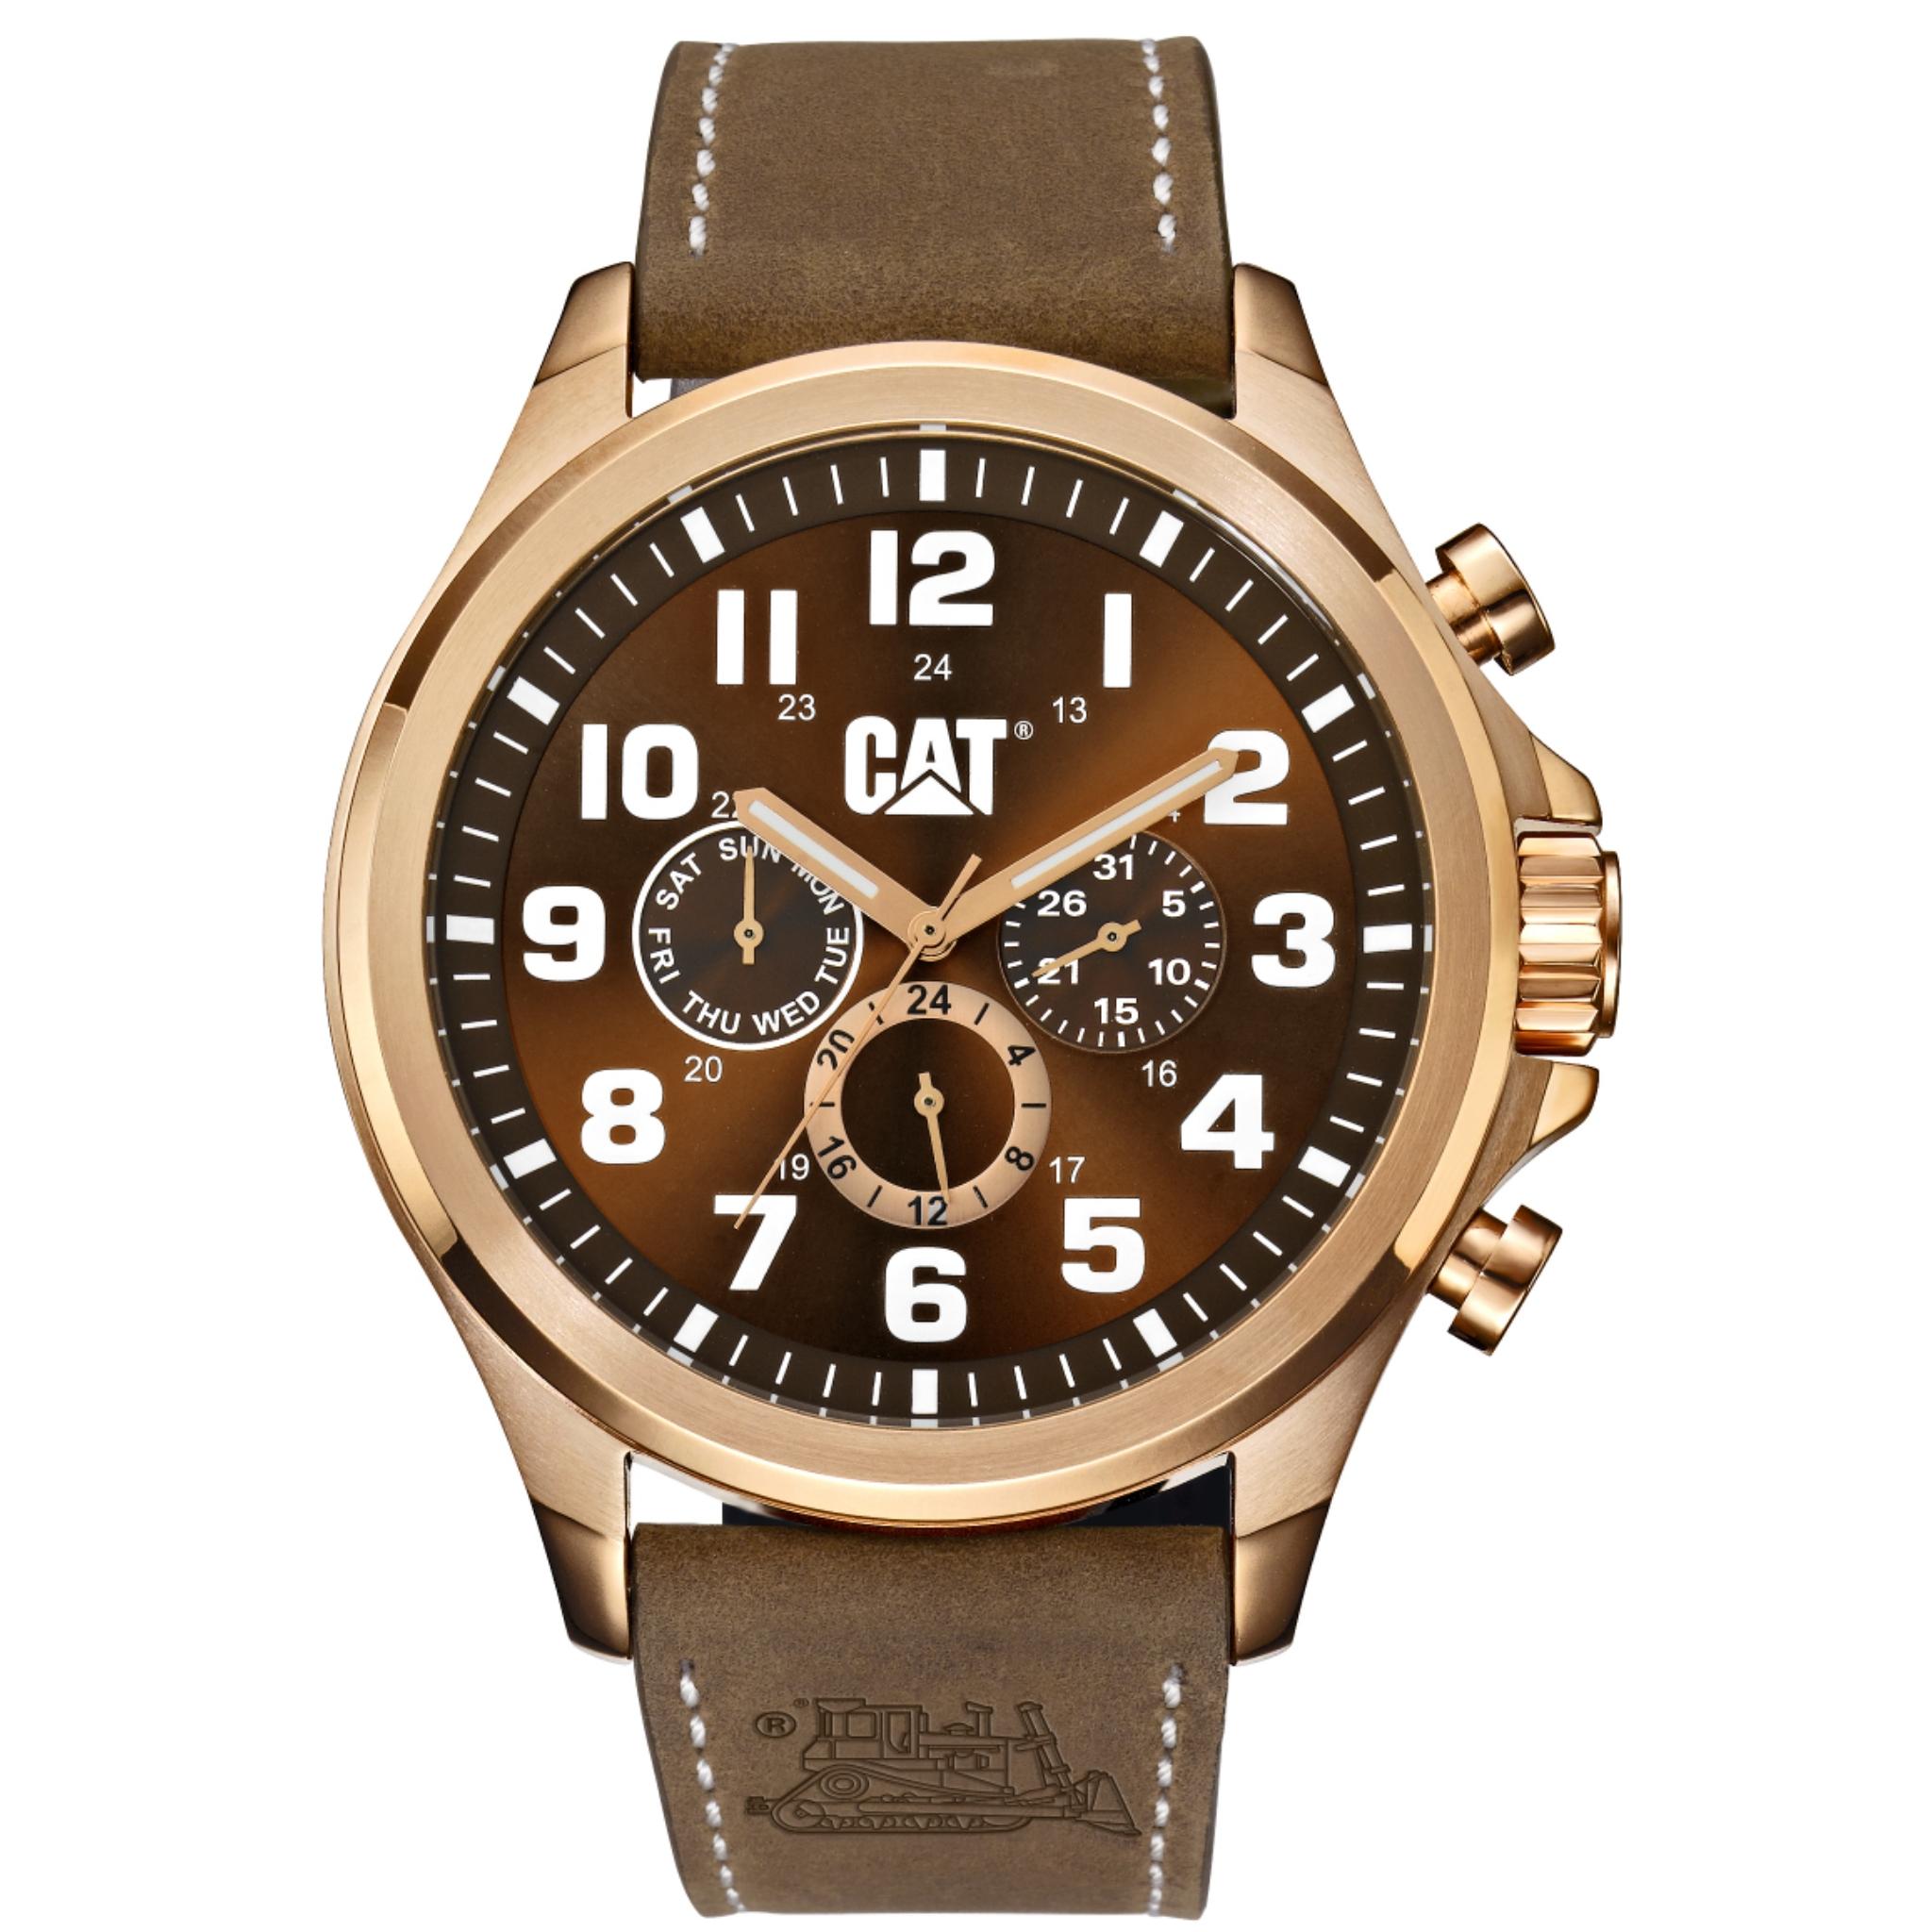 ساعت مچی عقربه ای مردانه کاترپیلار مدل PU.199.35.919